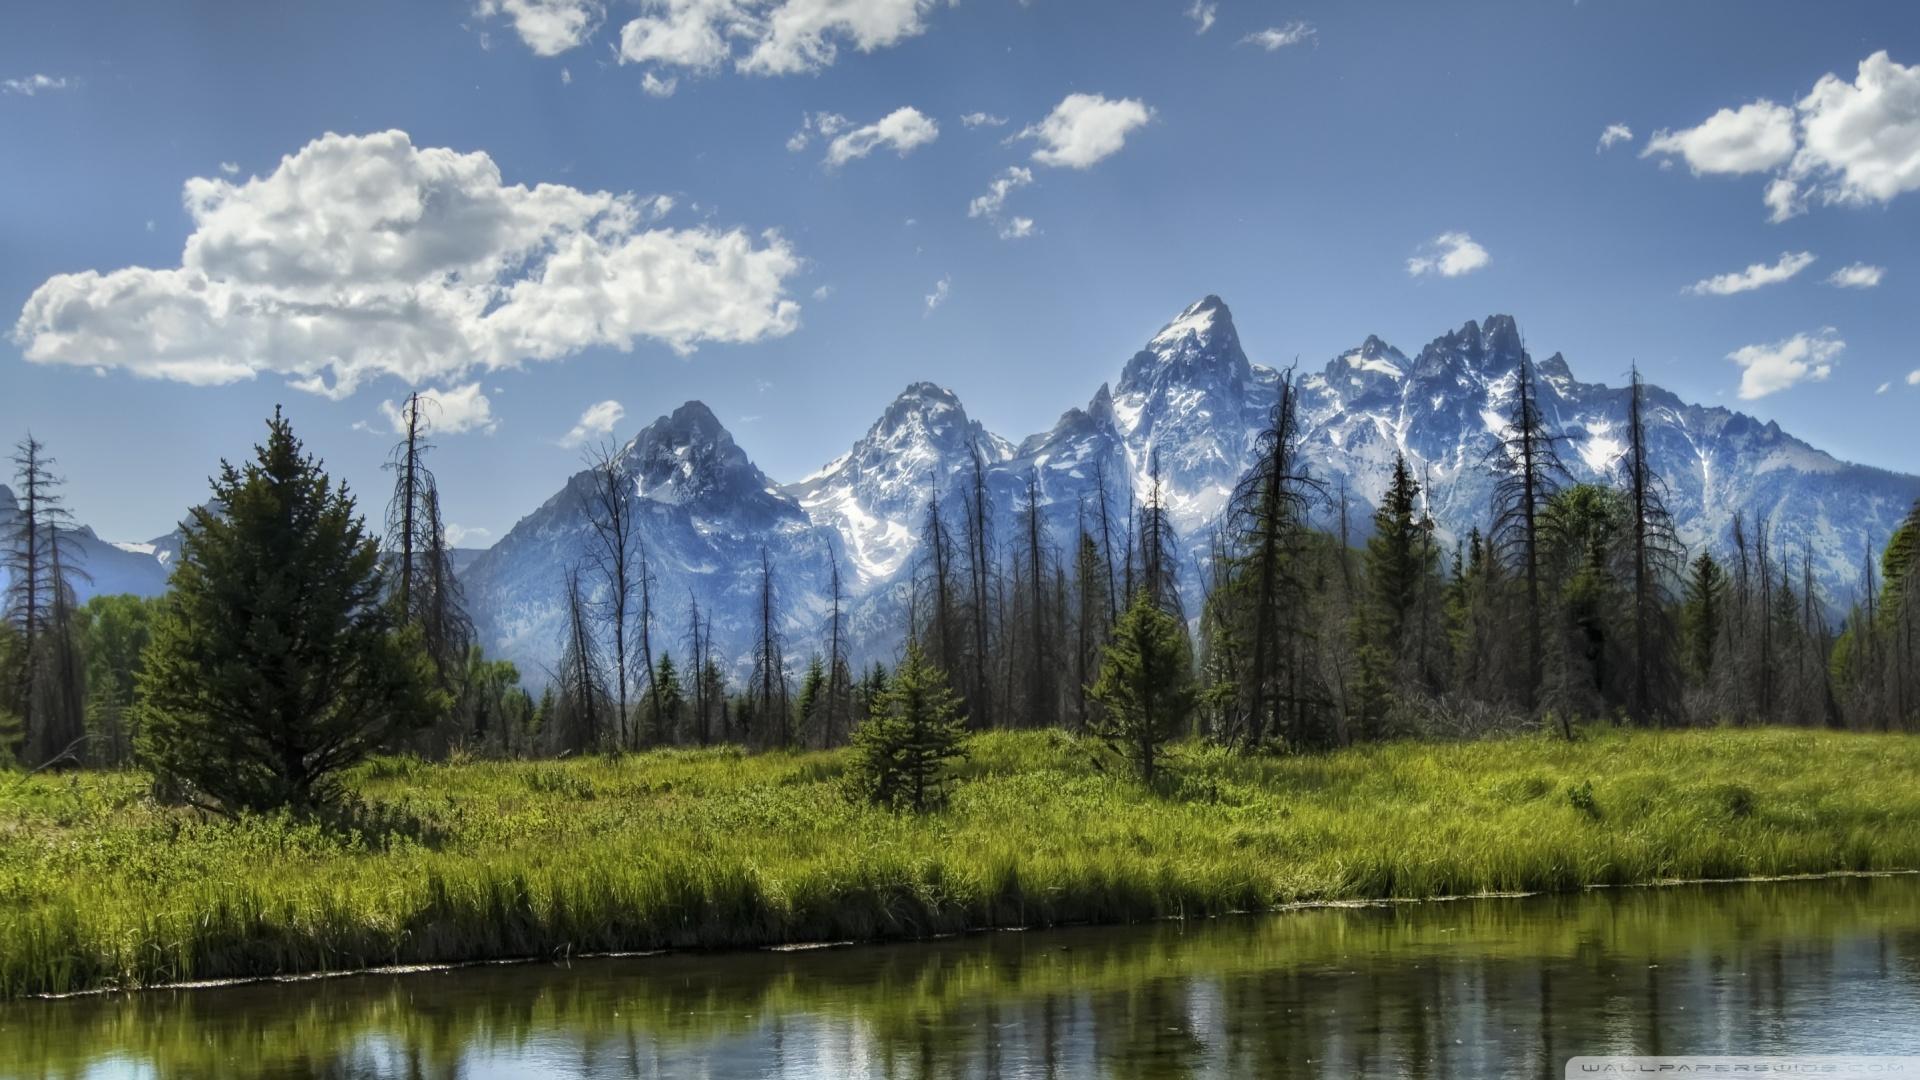 Free Download Grand Teton National Park Wallpaper 1920x1080 Grand